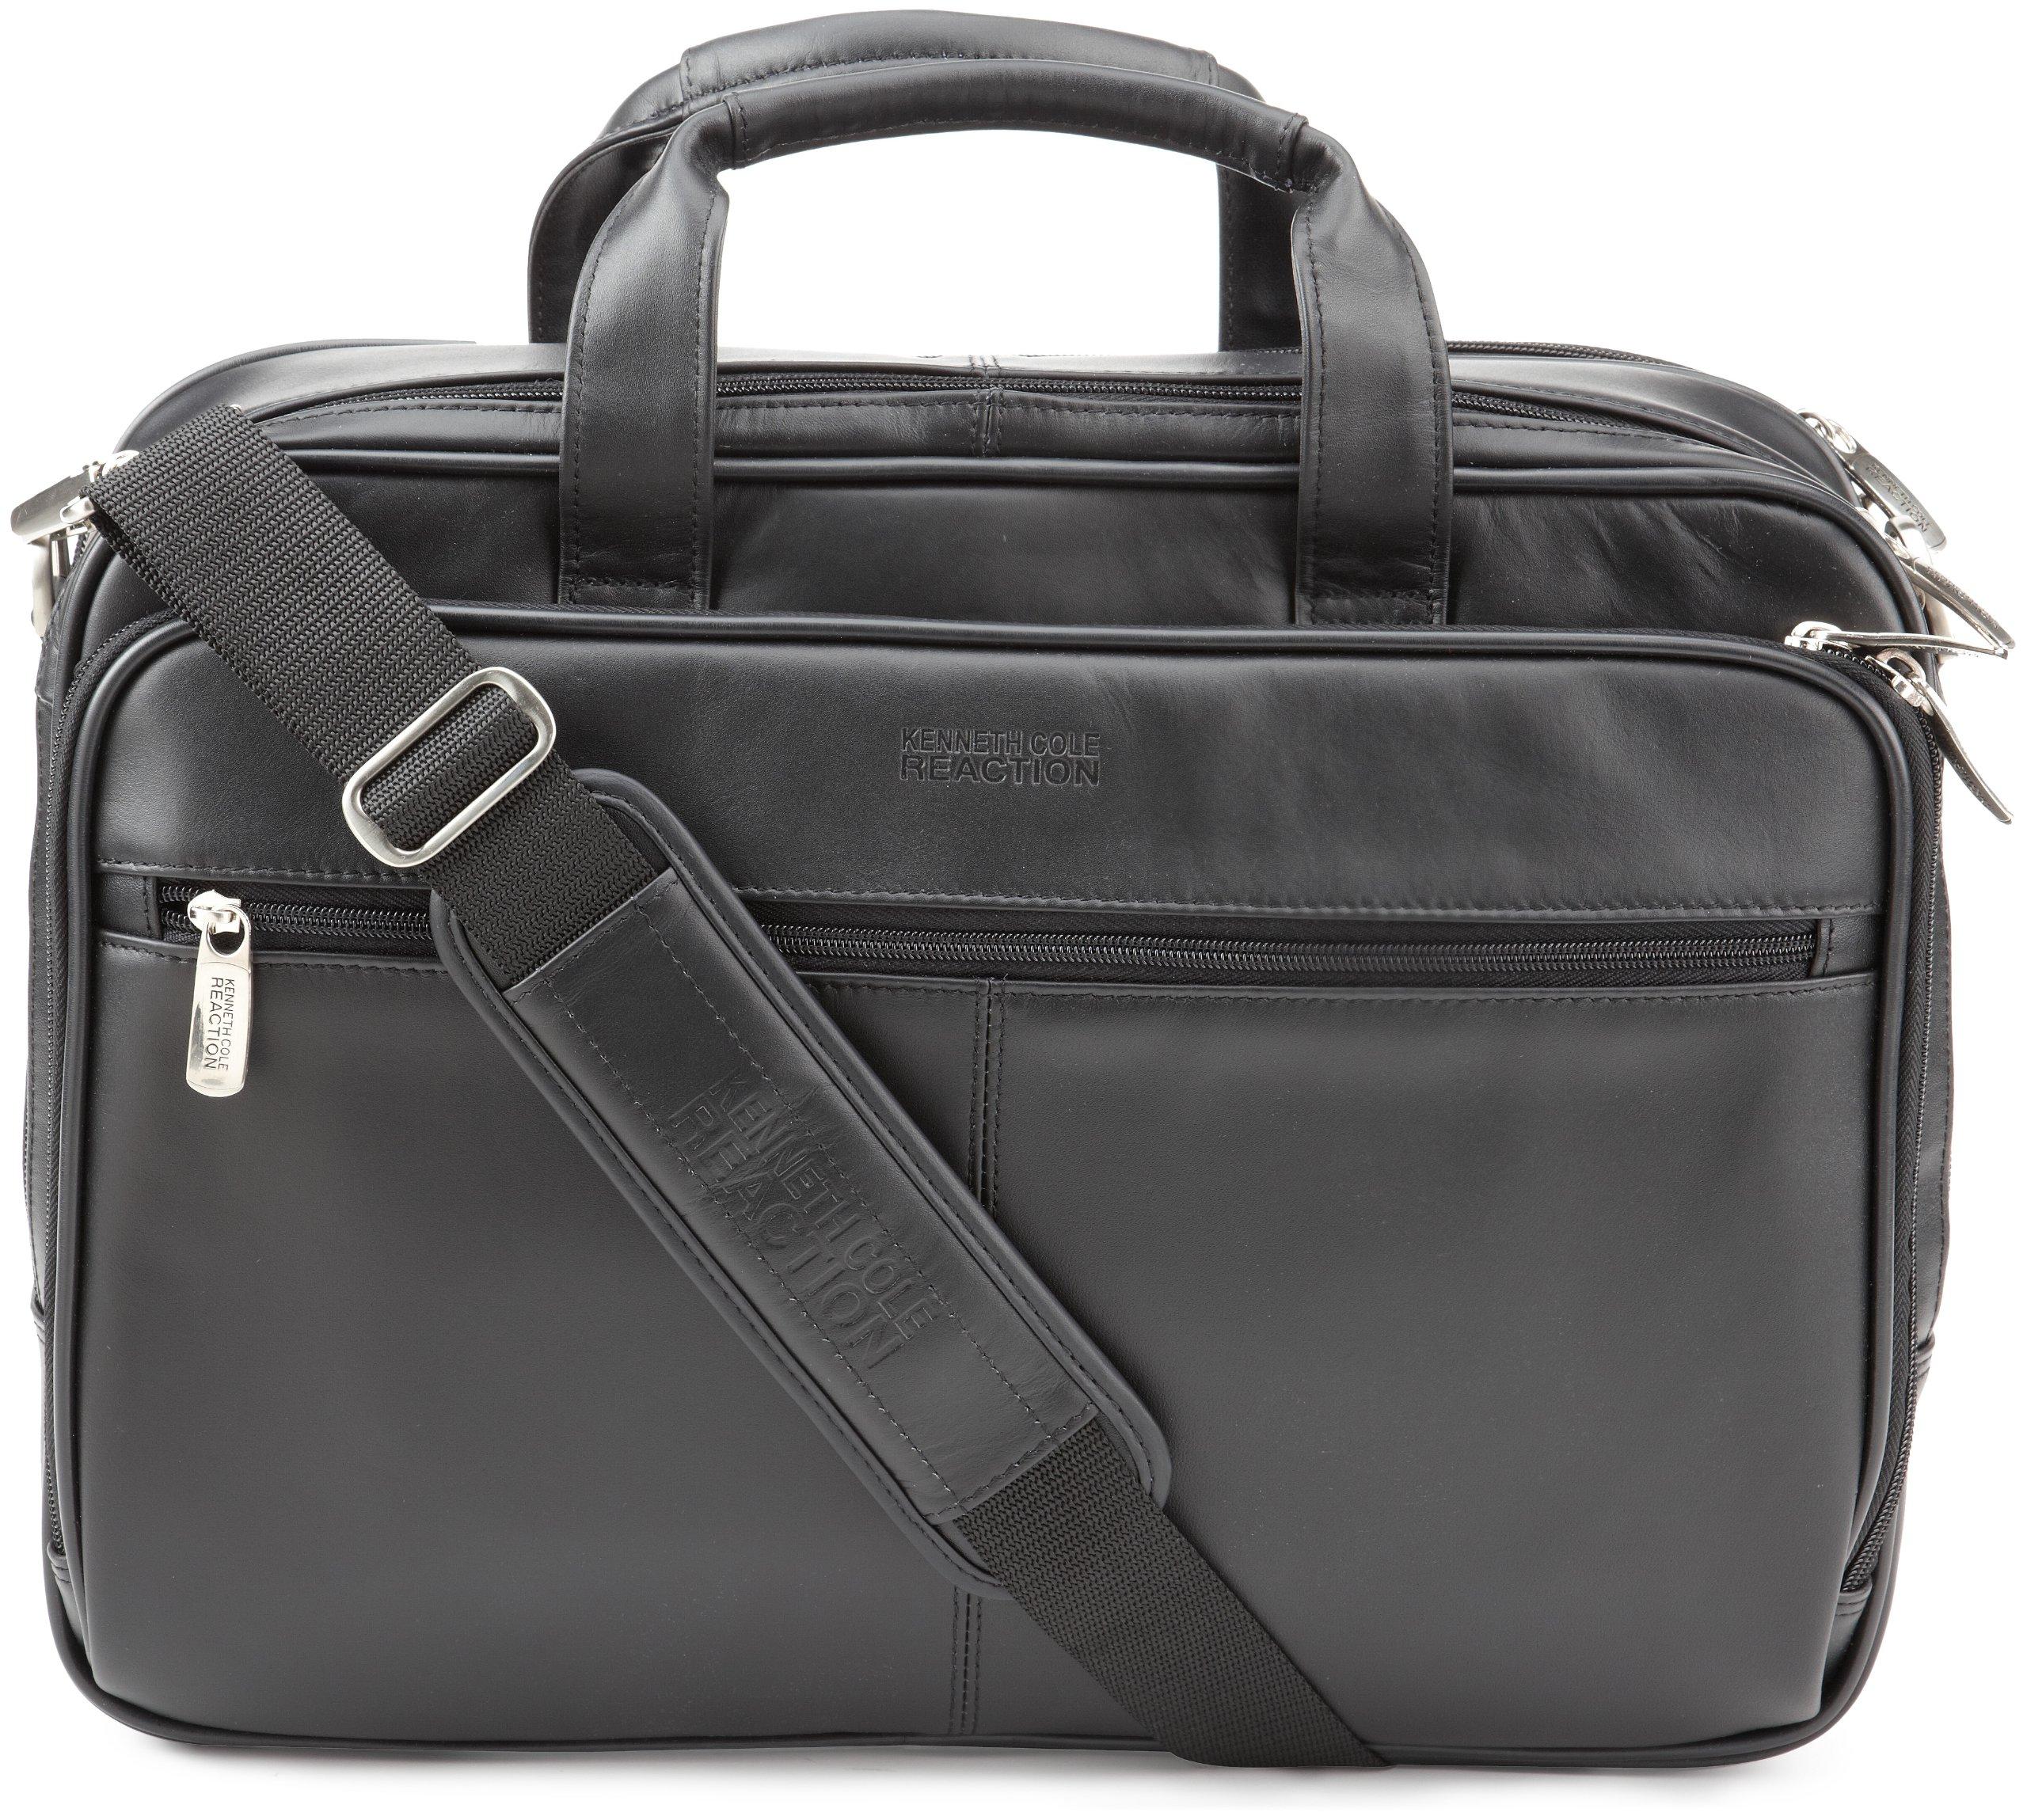 Kenneth Cole Leather Portfolio/Computer Case, Black, Fits 15.4'' laptop, Black, One Size